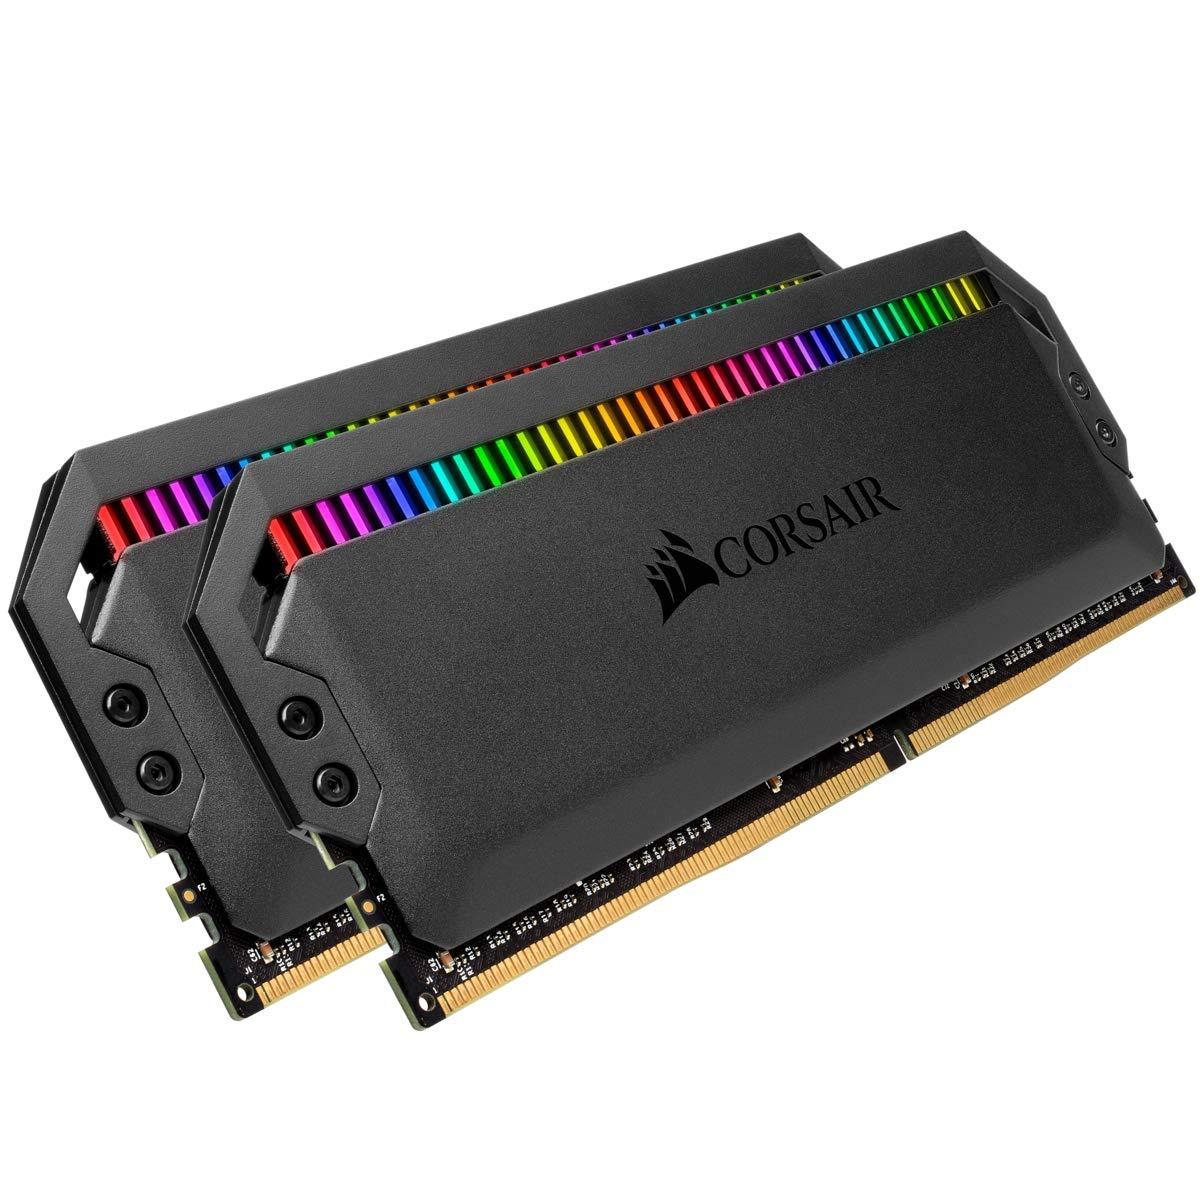 Corsair Dominator Platinum RGB 32GB (2x16GB) DDR4 3200 (PC4-25600) C16 1.35V Desktop Memory by Corsair